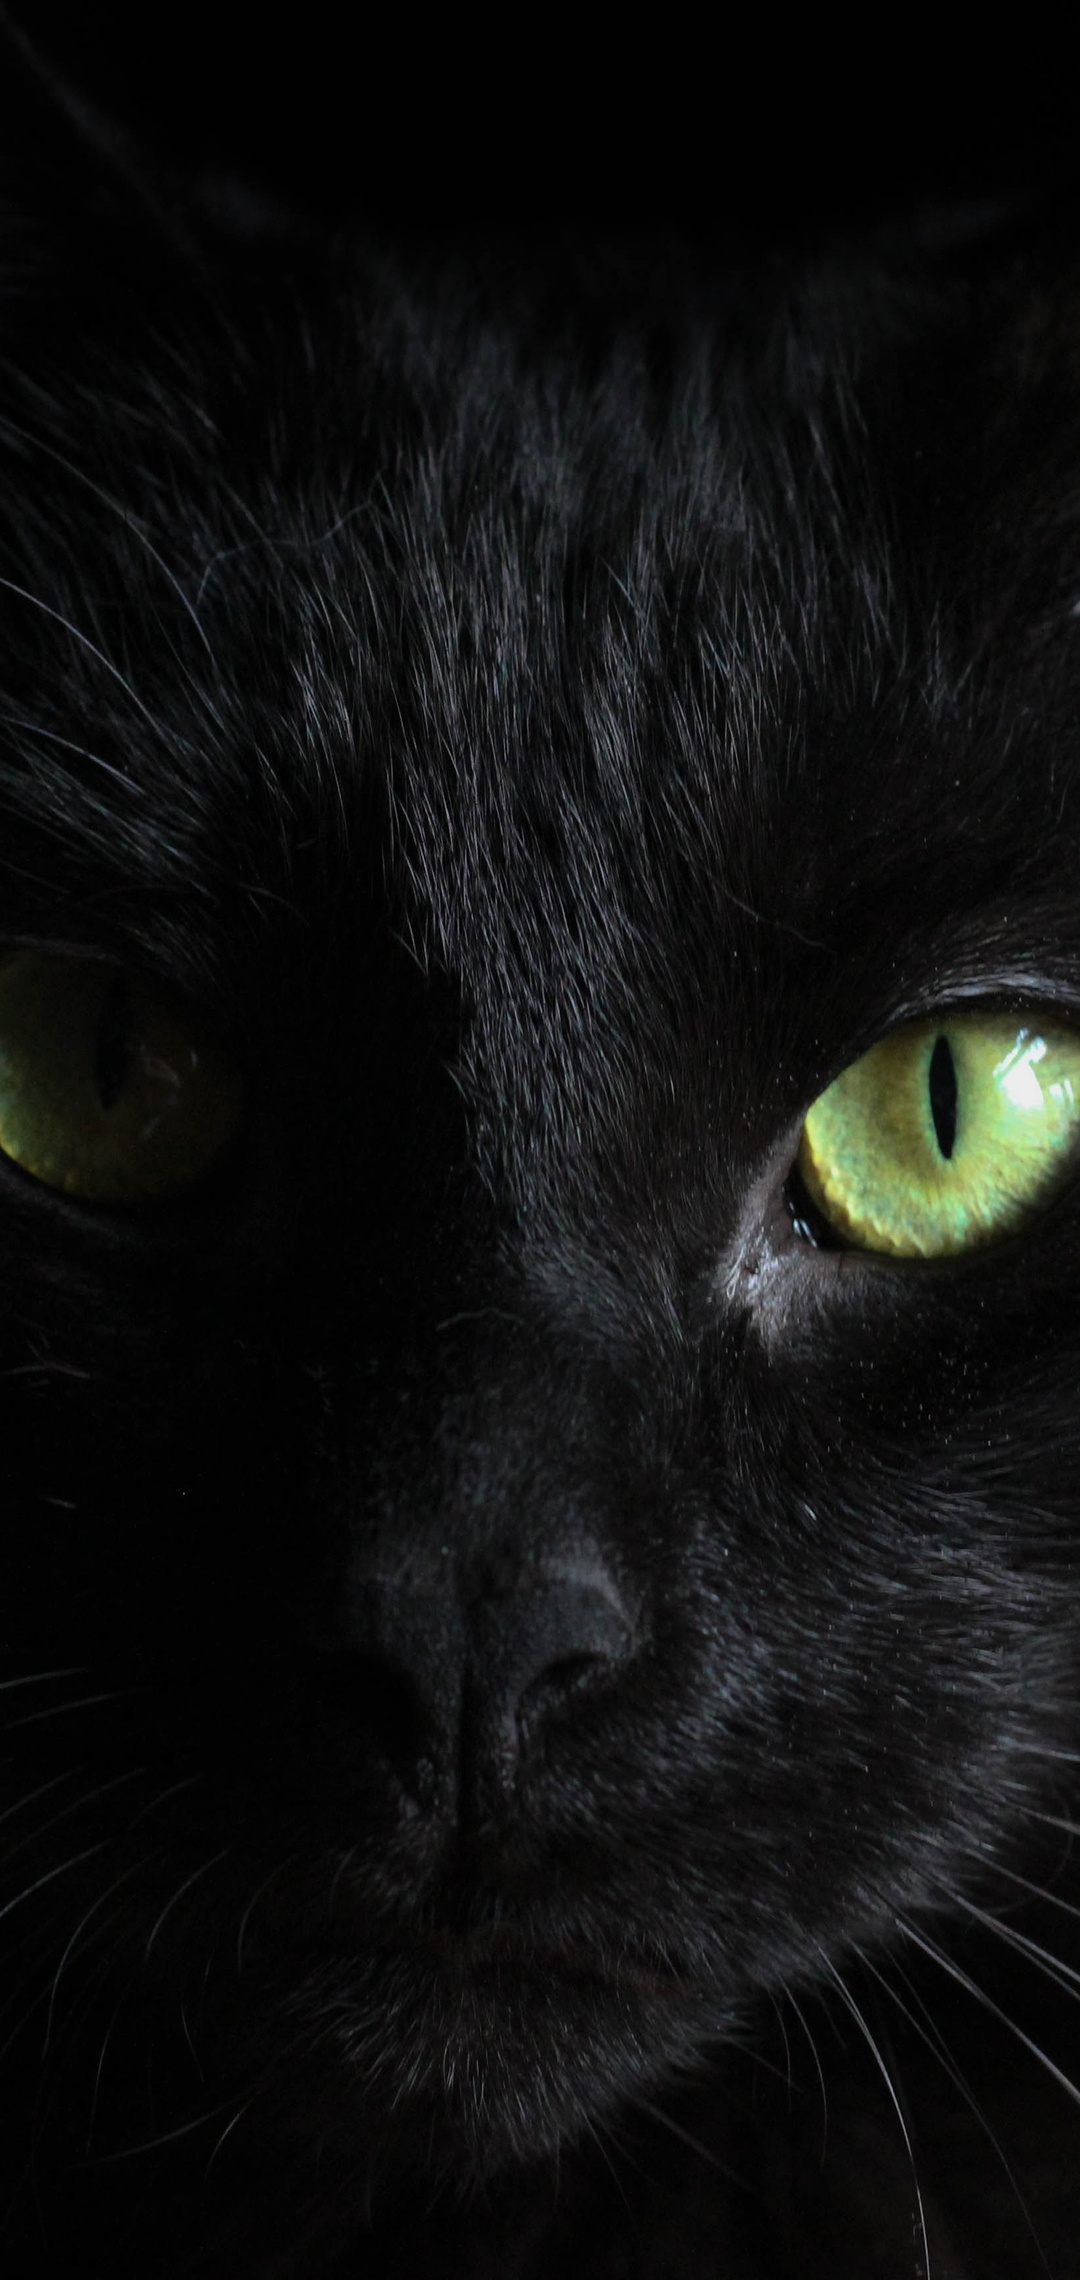 black-cat-green-eyes-wl.jpg